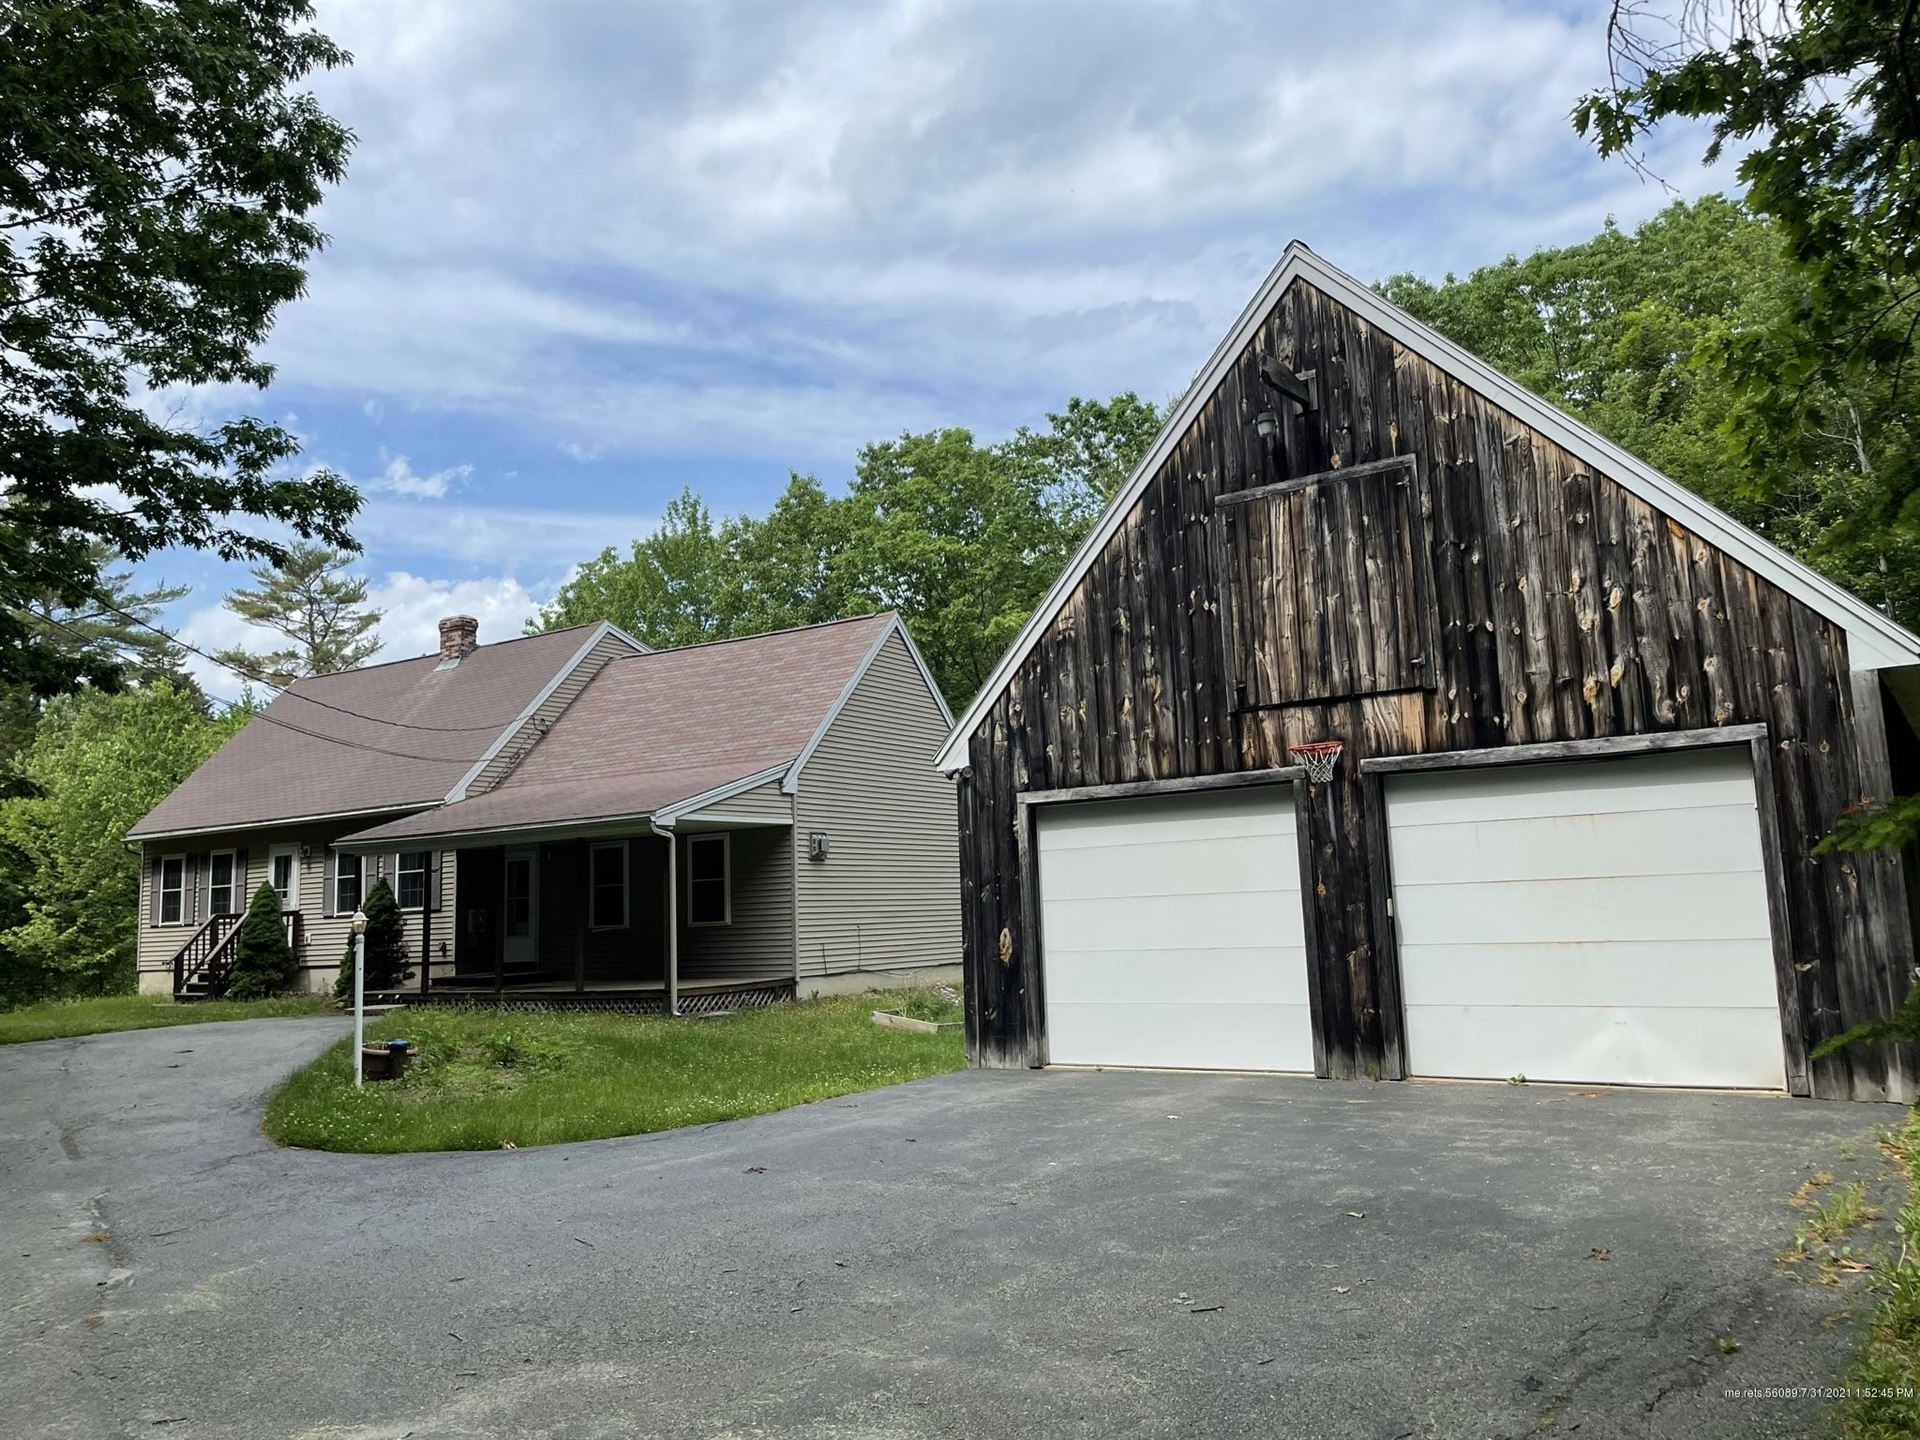 Photo of 75 Farmview Lane, Freeport, ME 04032 (MLS # 1495893)